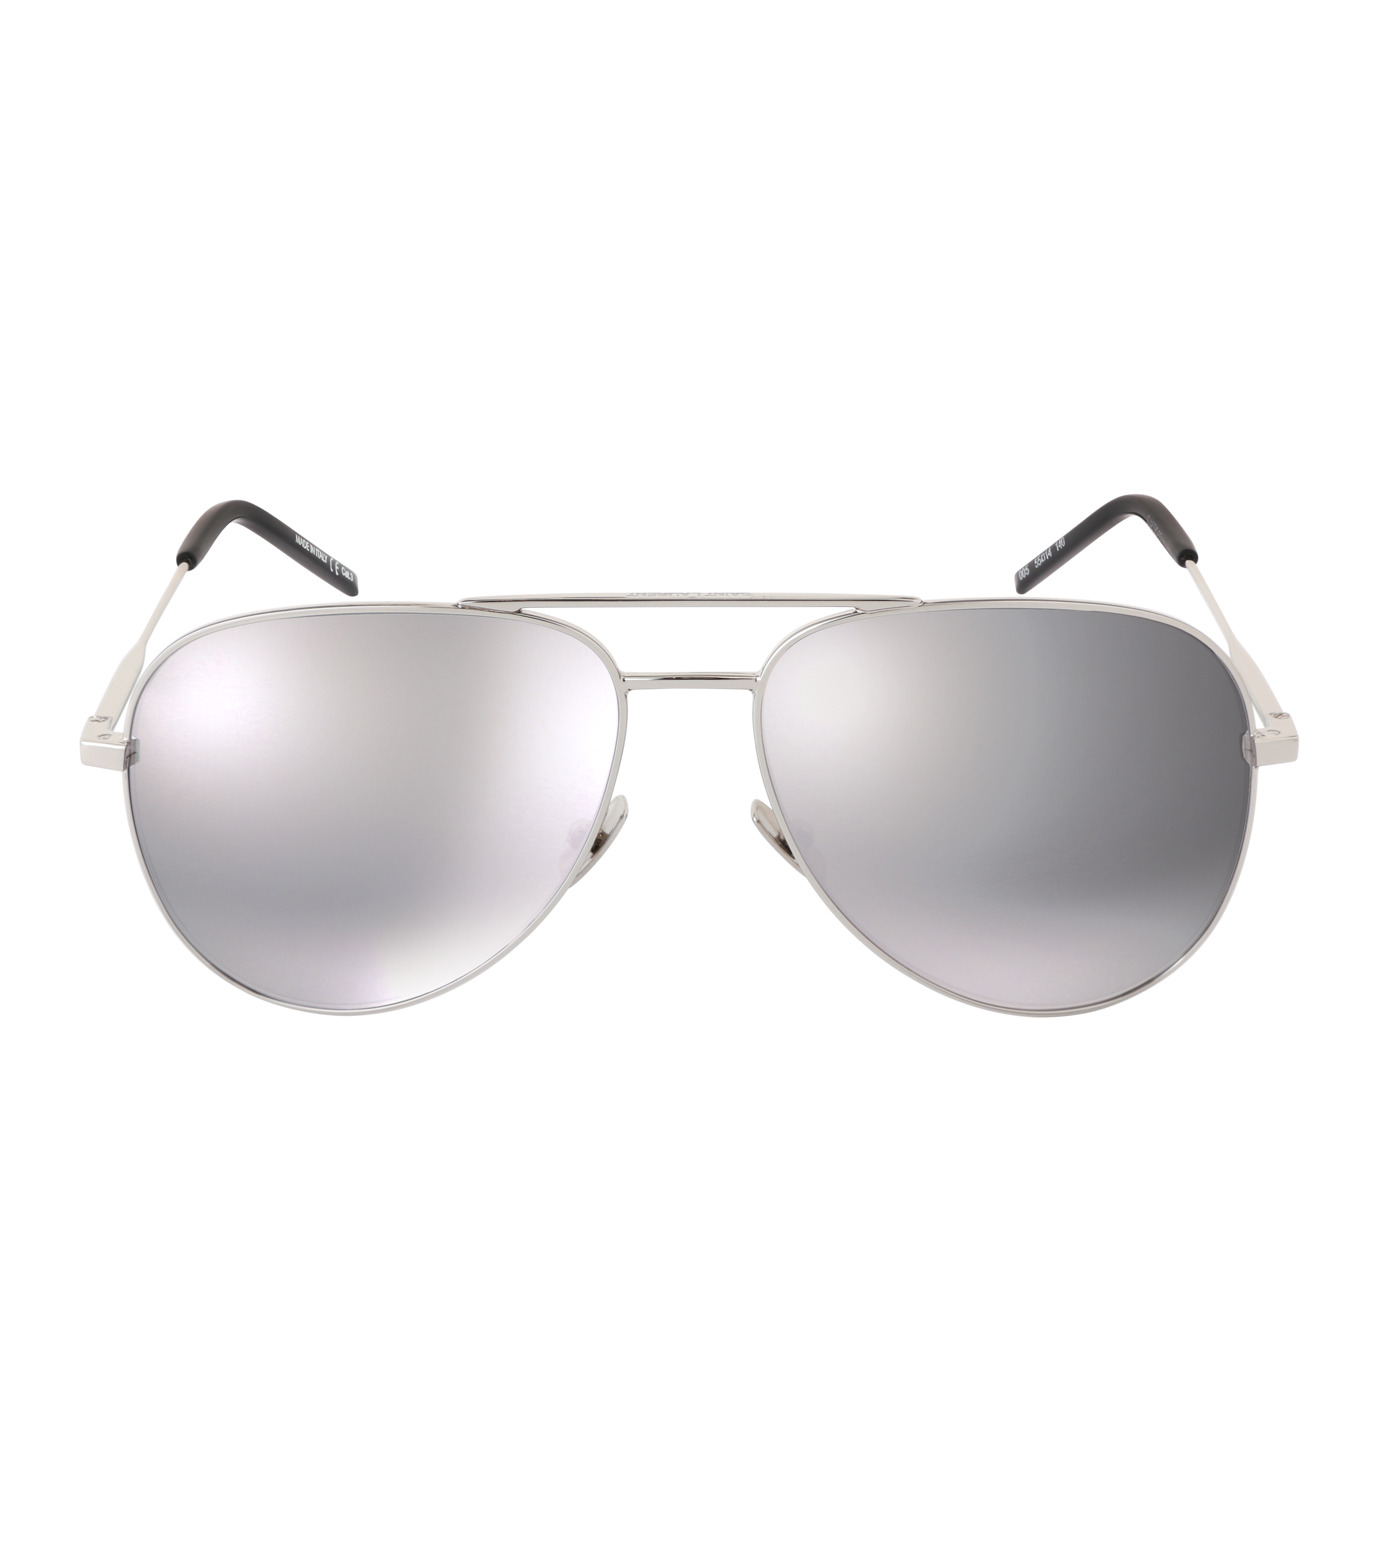 SAINT LAURENT(サンローラン)のClassic 11 Mens Teardrop-SILVER(アイウェア/eyewear)-419696-1 拡大詳細画像3